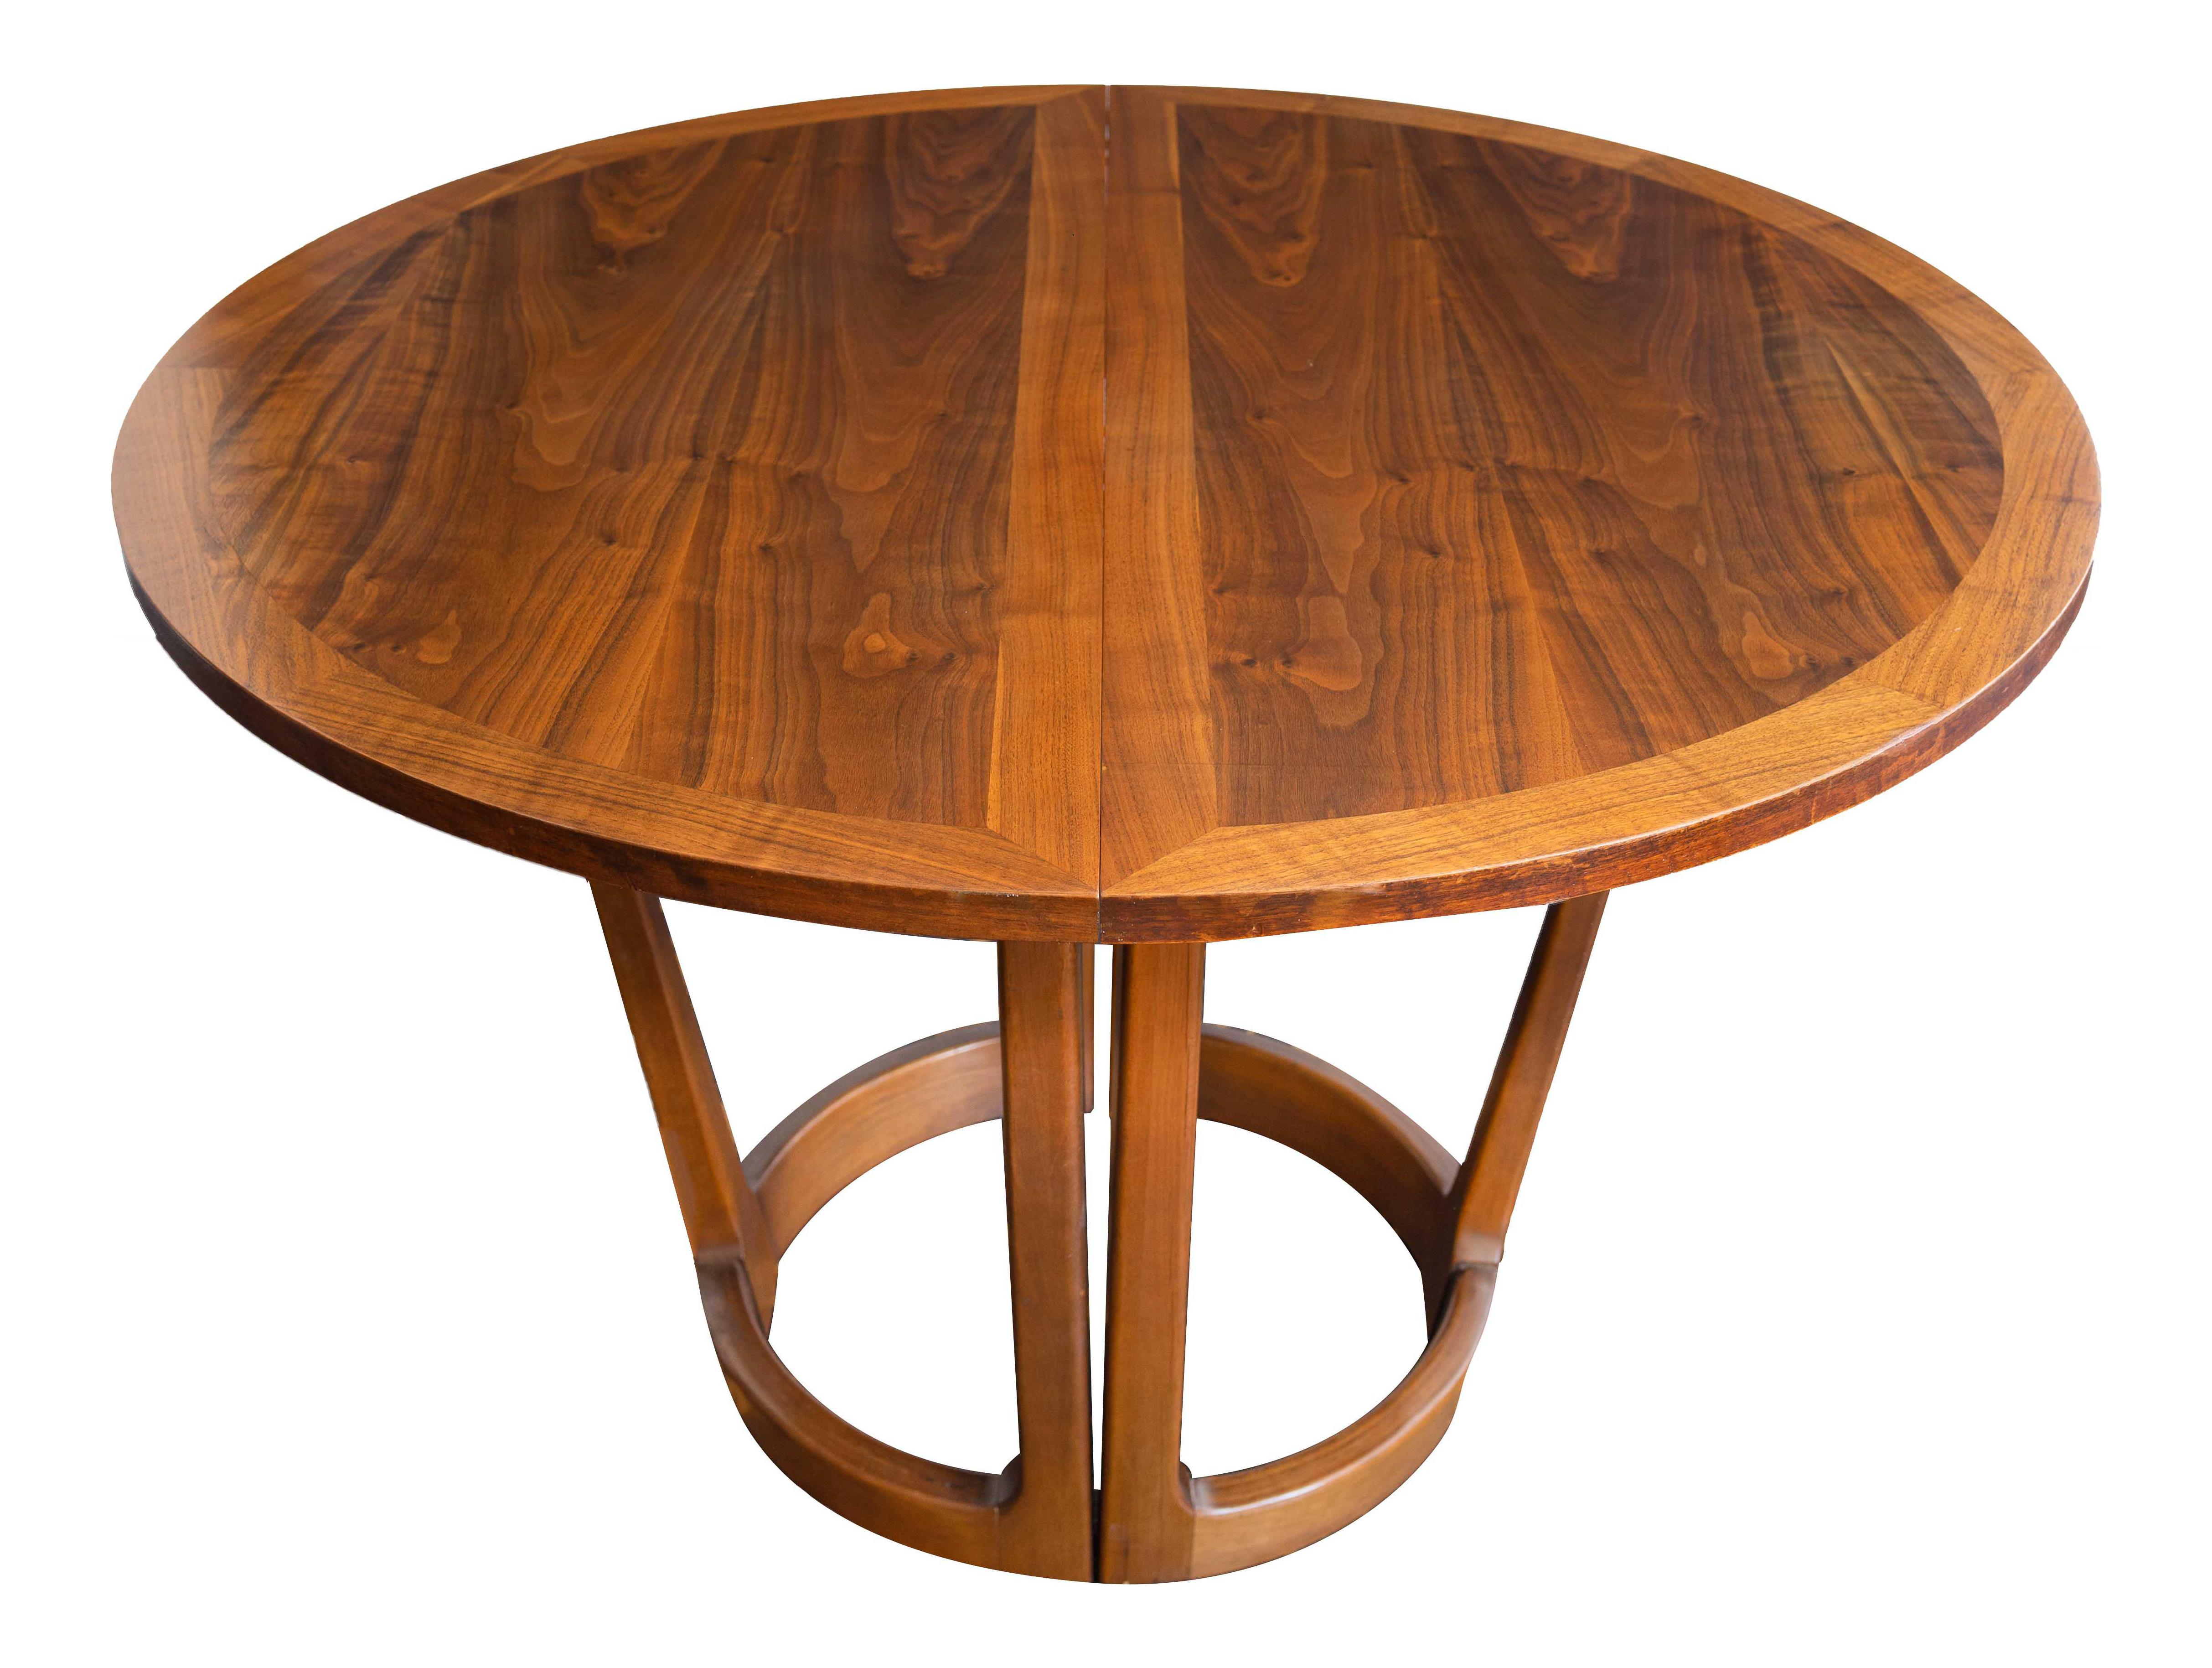 Vintage Mid Century Lane Rhythm Expandable Round Dining Table Chairish